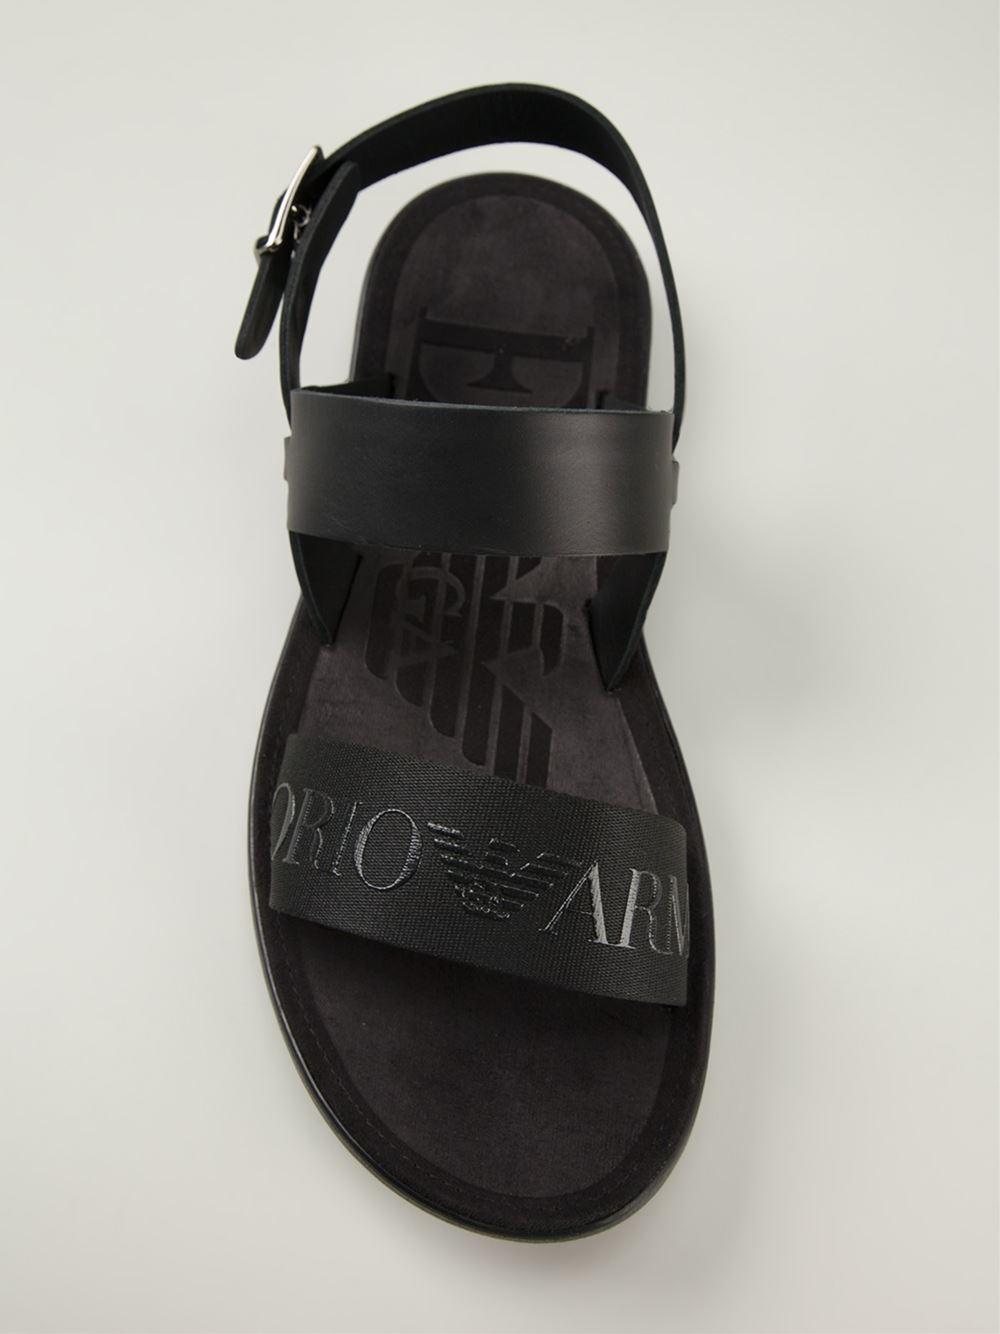 Lyst Emporio Armani Embossed Logo Strap Sandals In Black